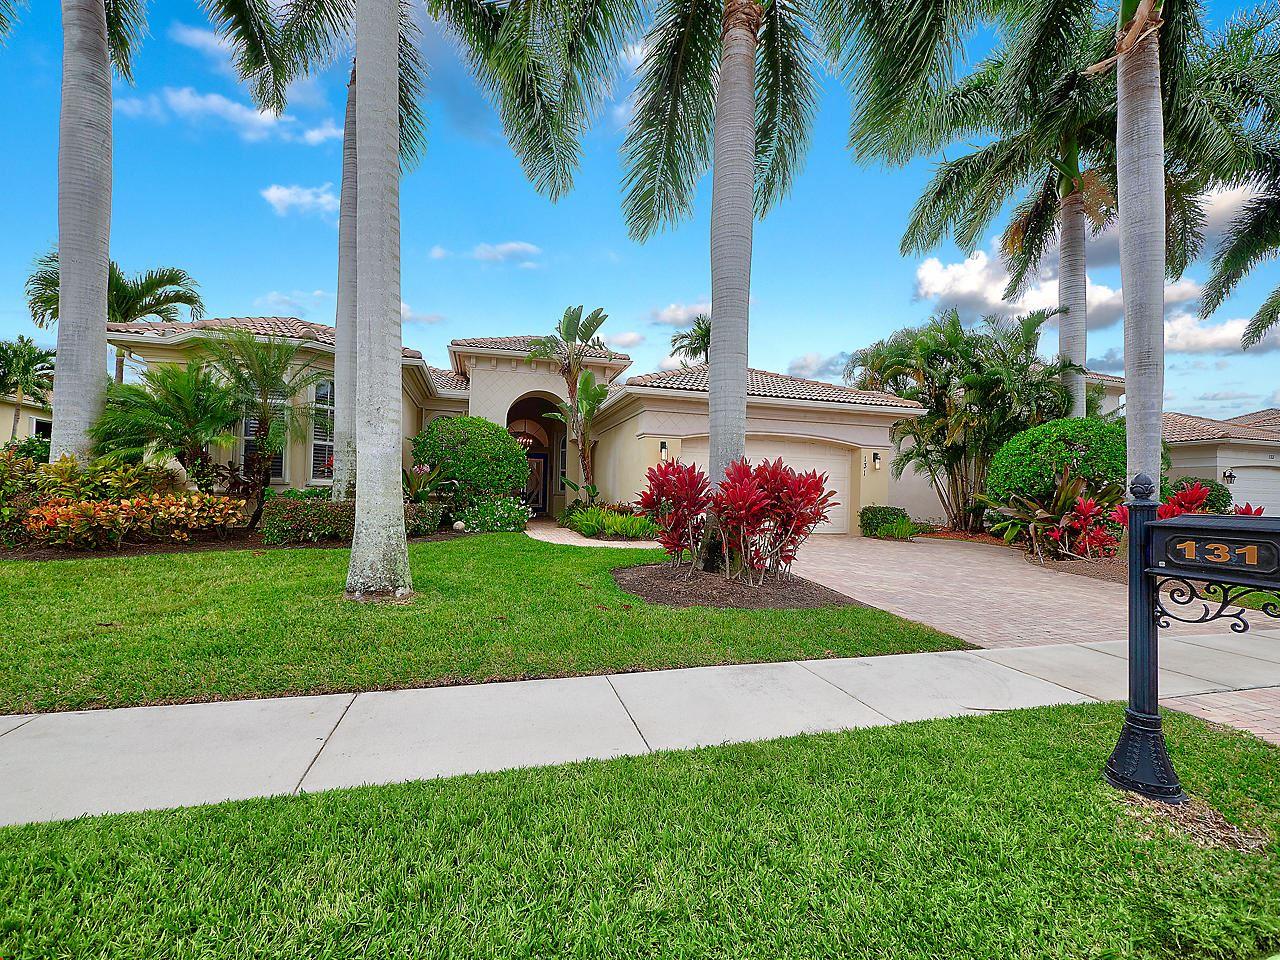 Photo of 131 Abondance Drive, Palm Beach Gardens, FL 33410 (MLS # RX-10588490)